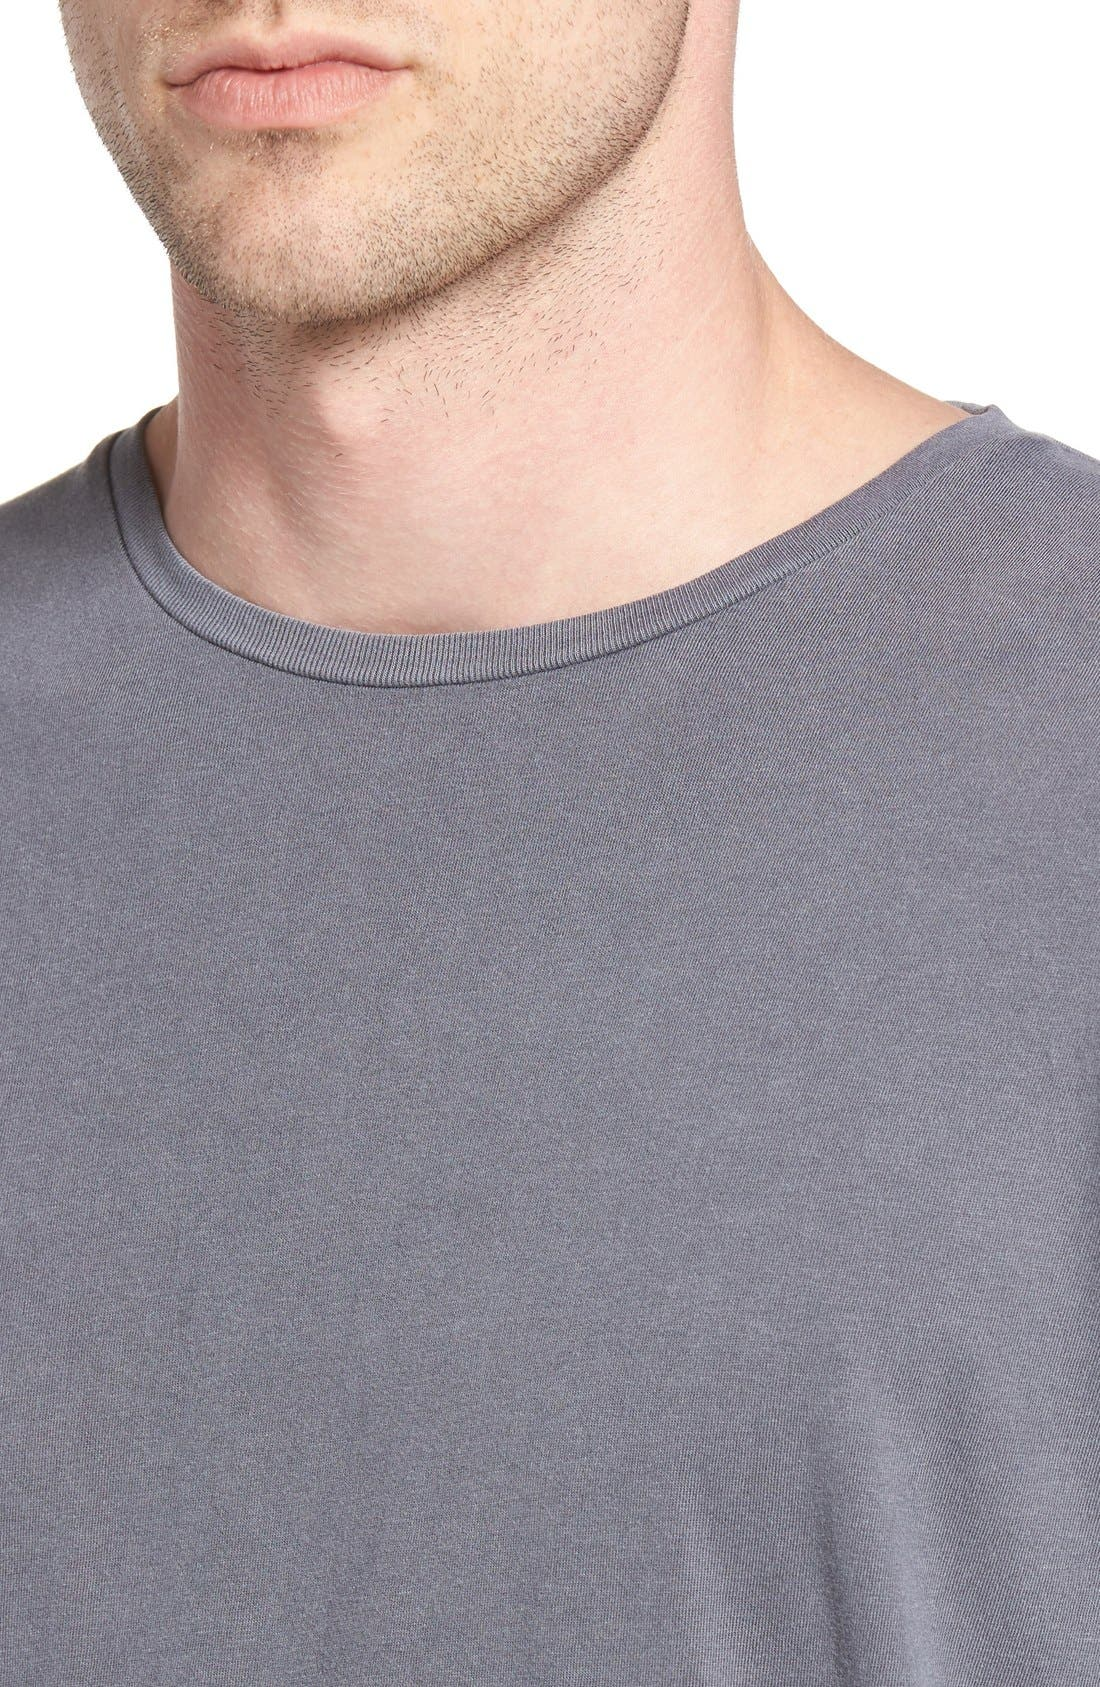 Flintlock Longline T-Shirt,                             Alternate thumbnail 8, color,                             029